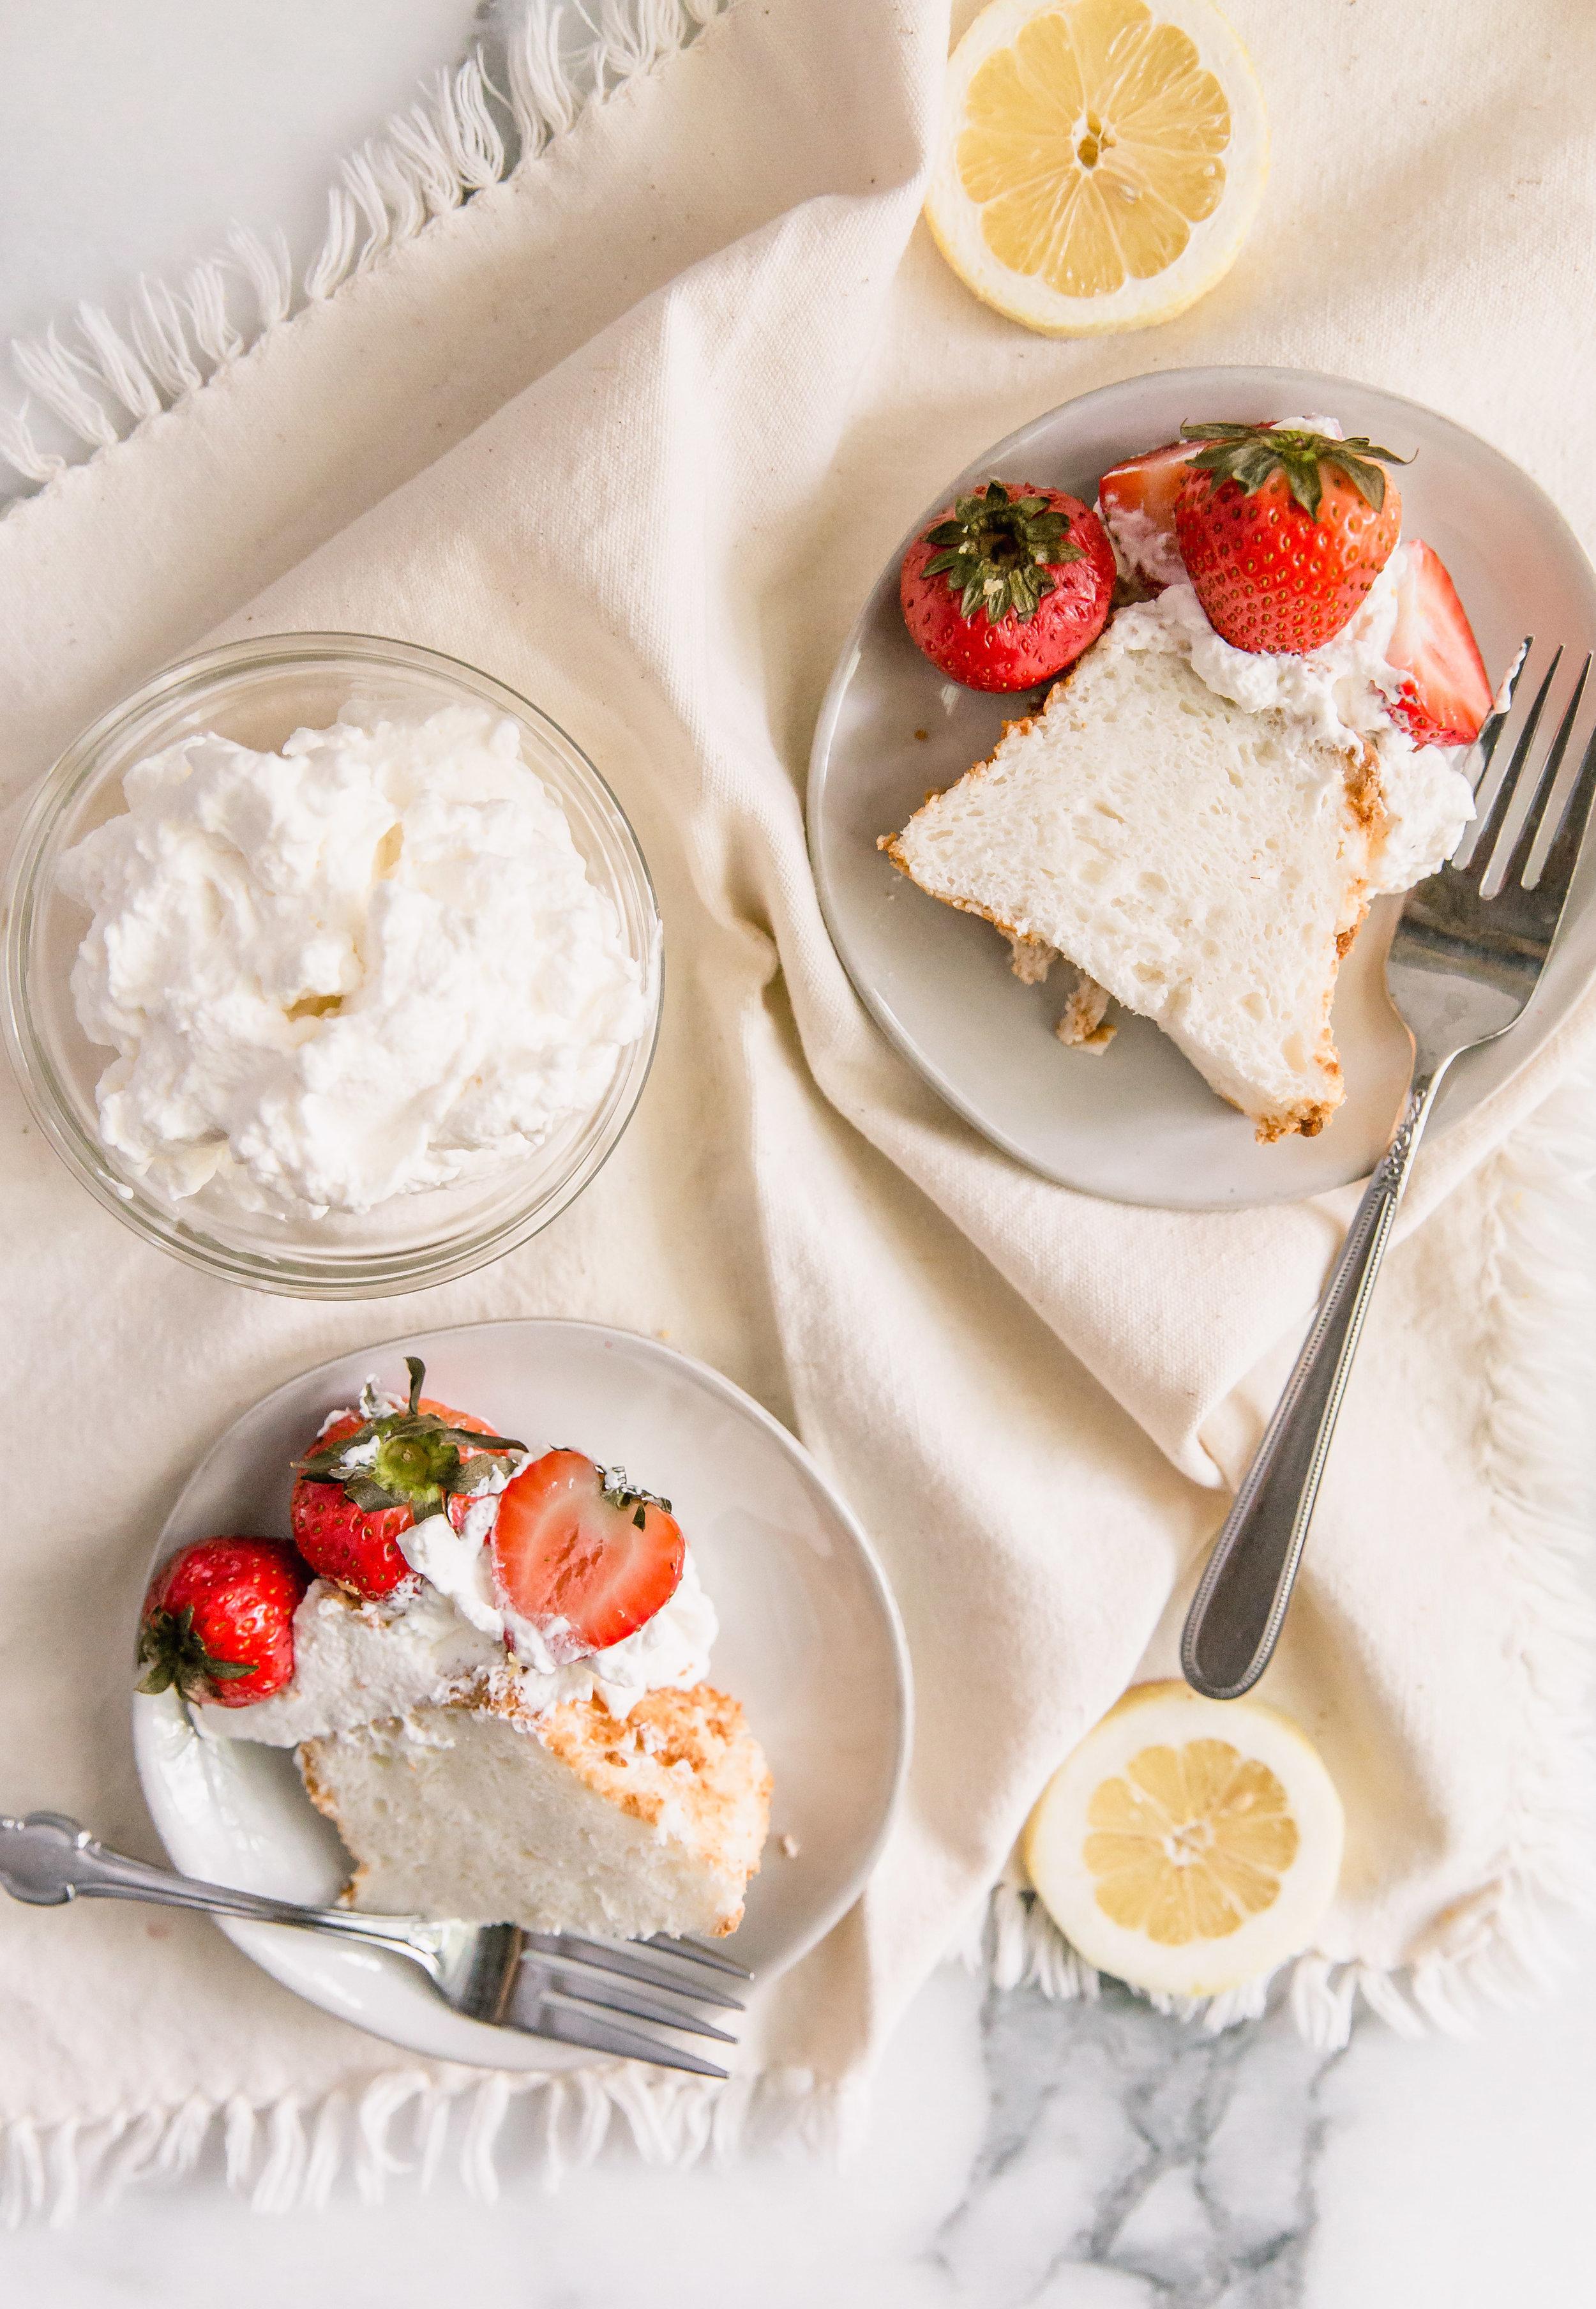 lemon-strawberry-shortcake-7.jpg